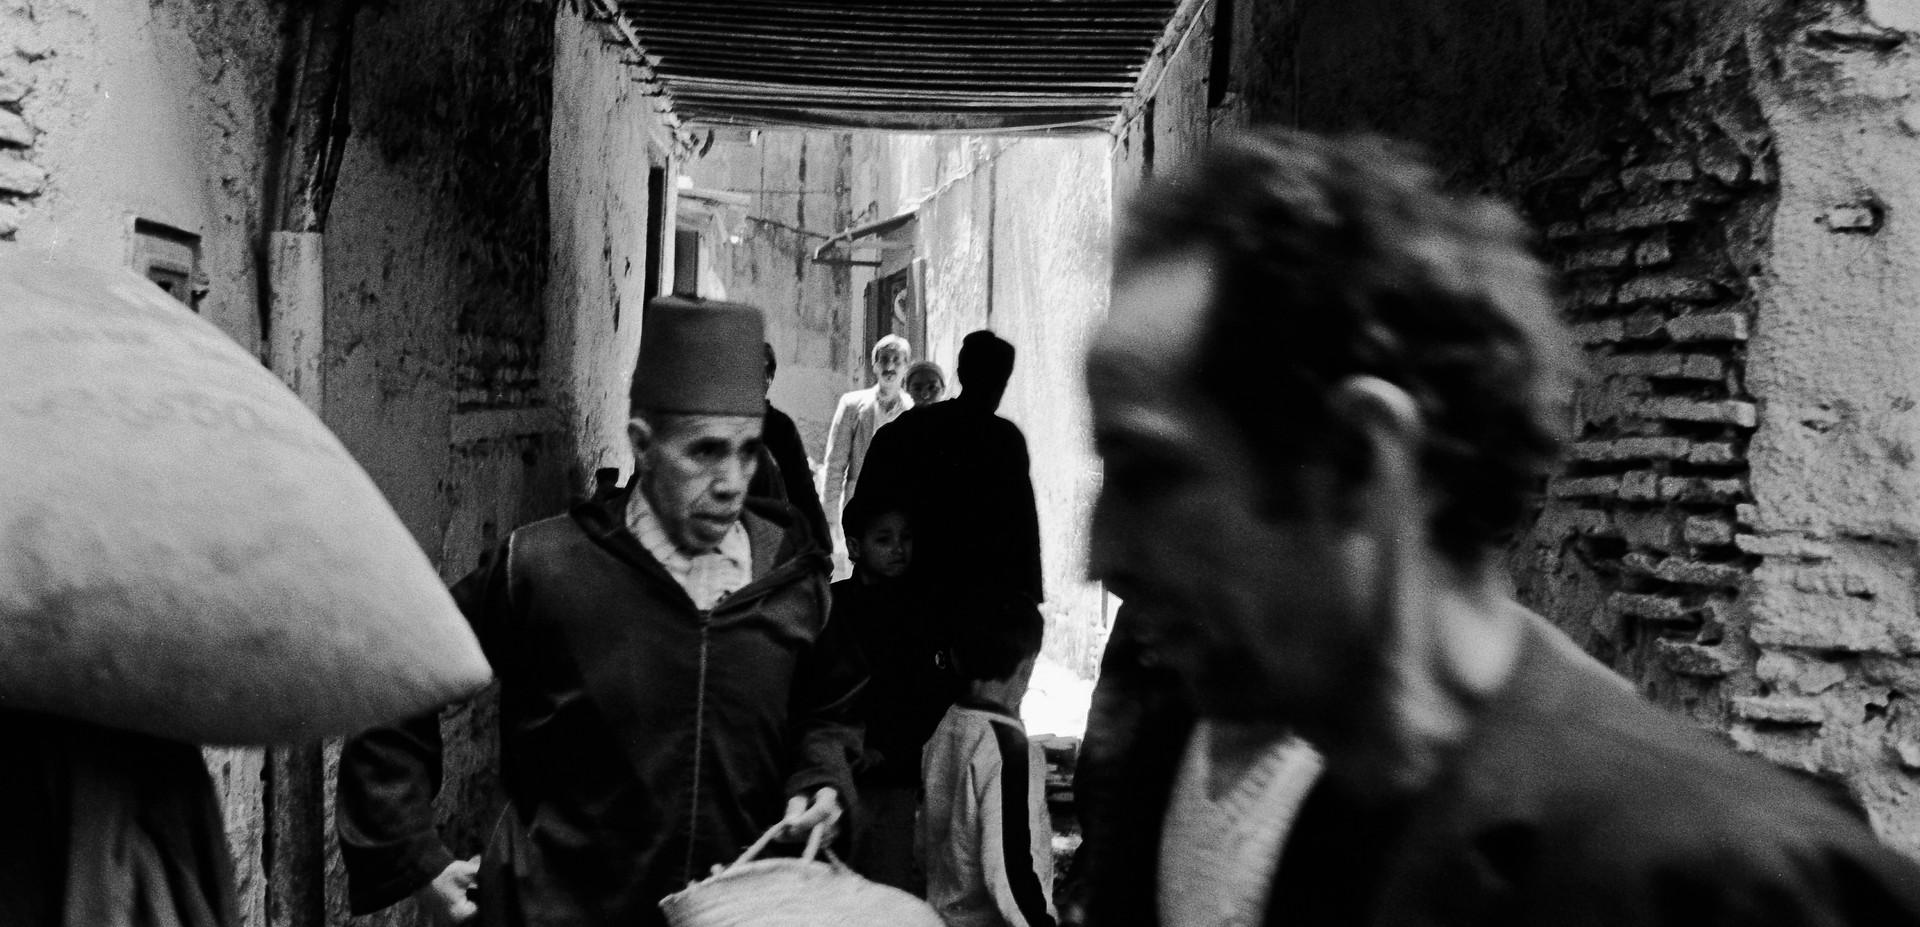 Street scene_Fez, Morocco 1986